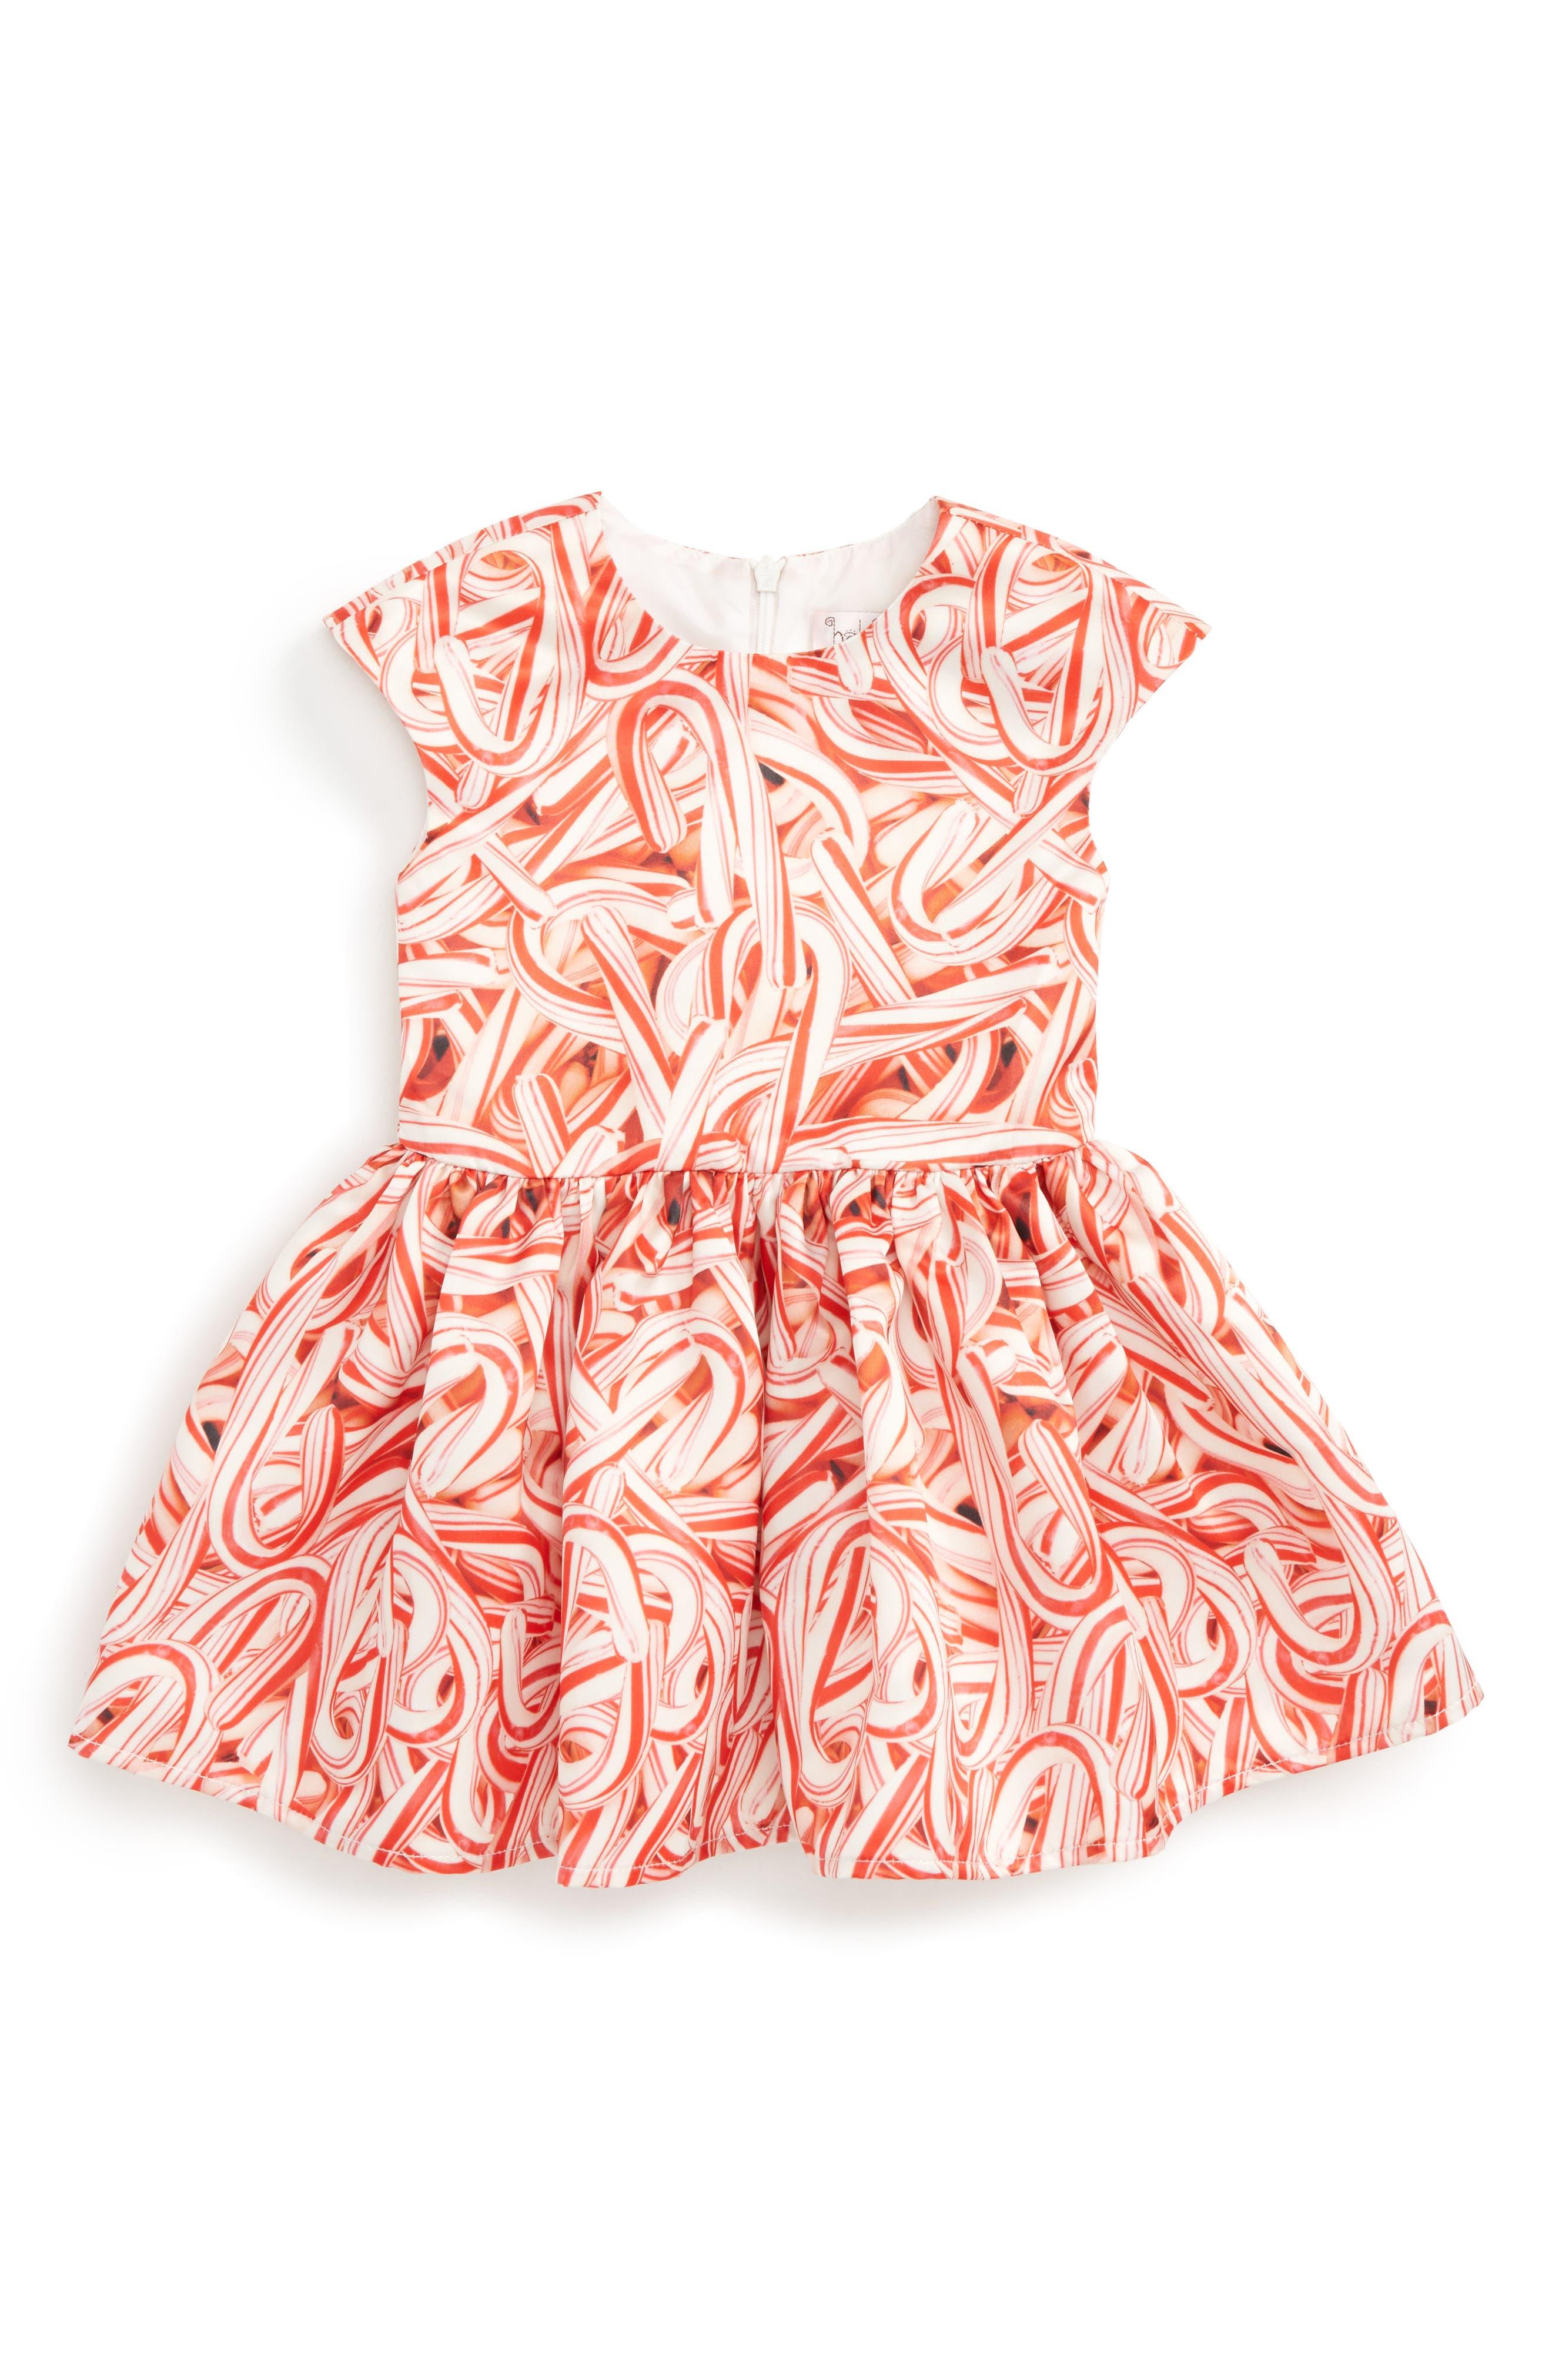 Main Image - Halabaloo Candy Cane Print Dress (Baby Girls)